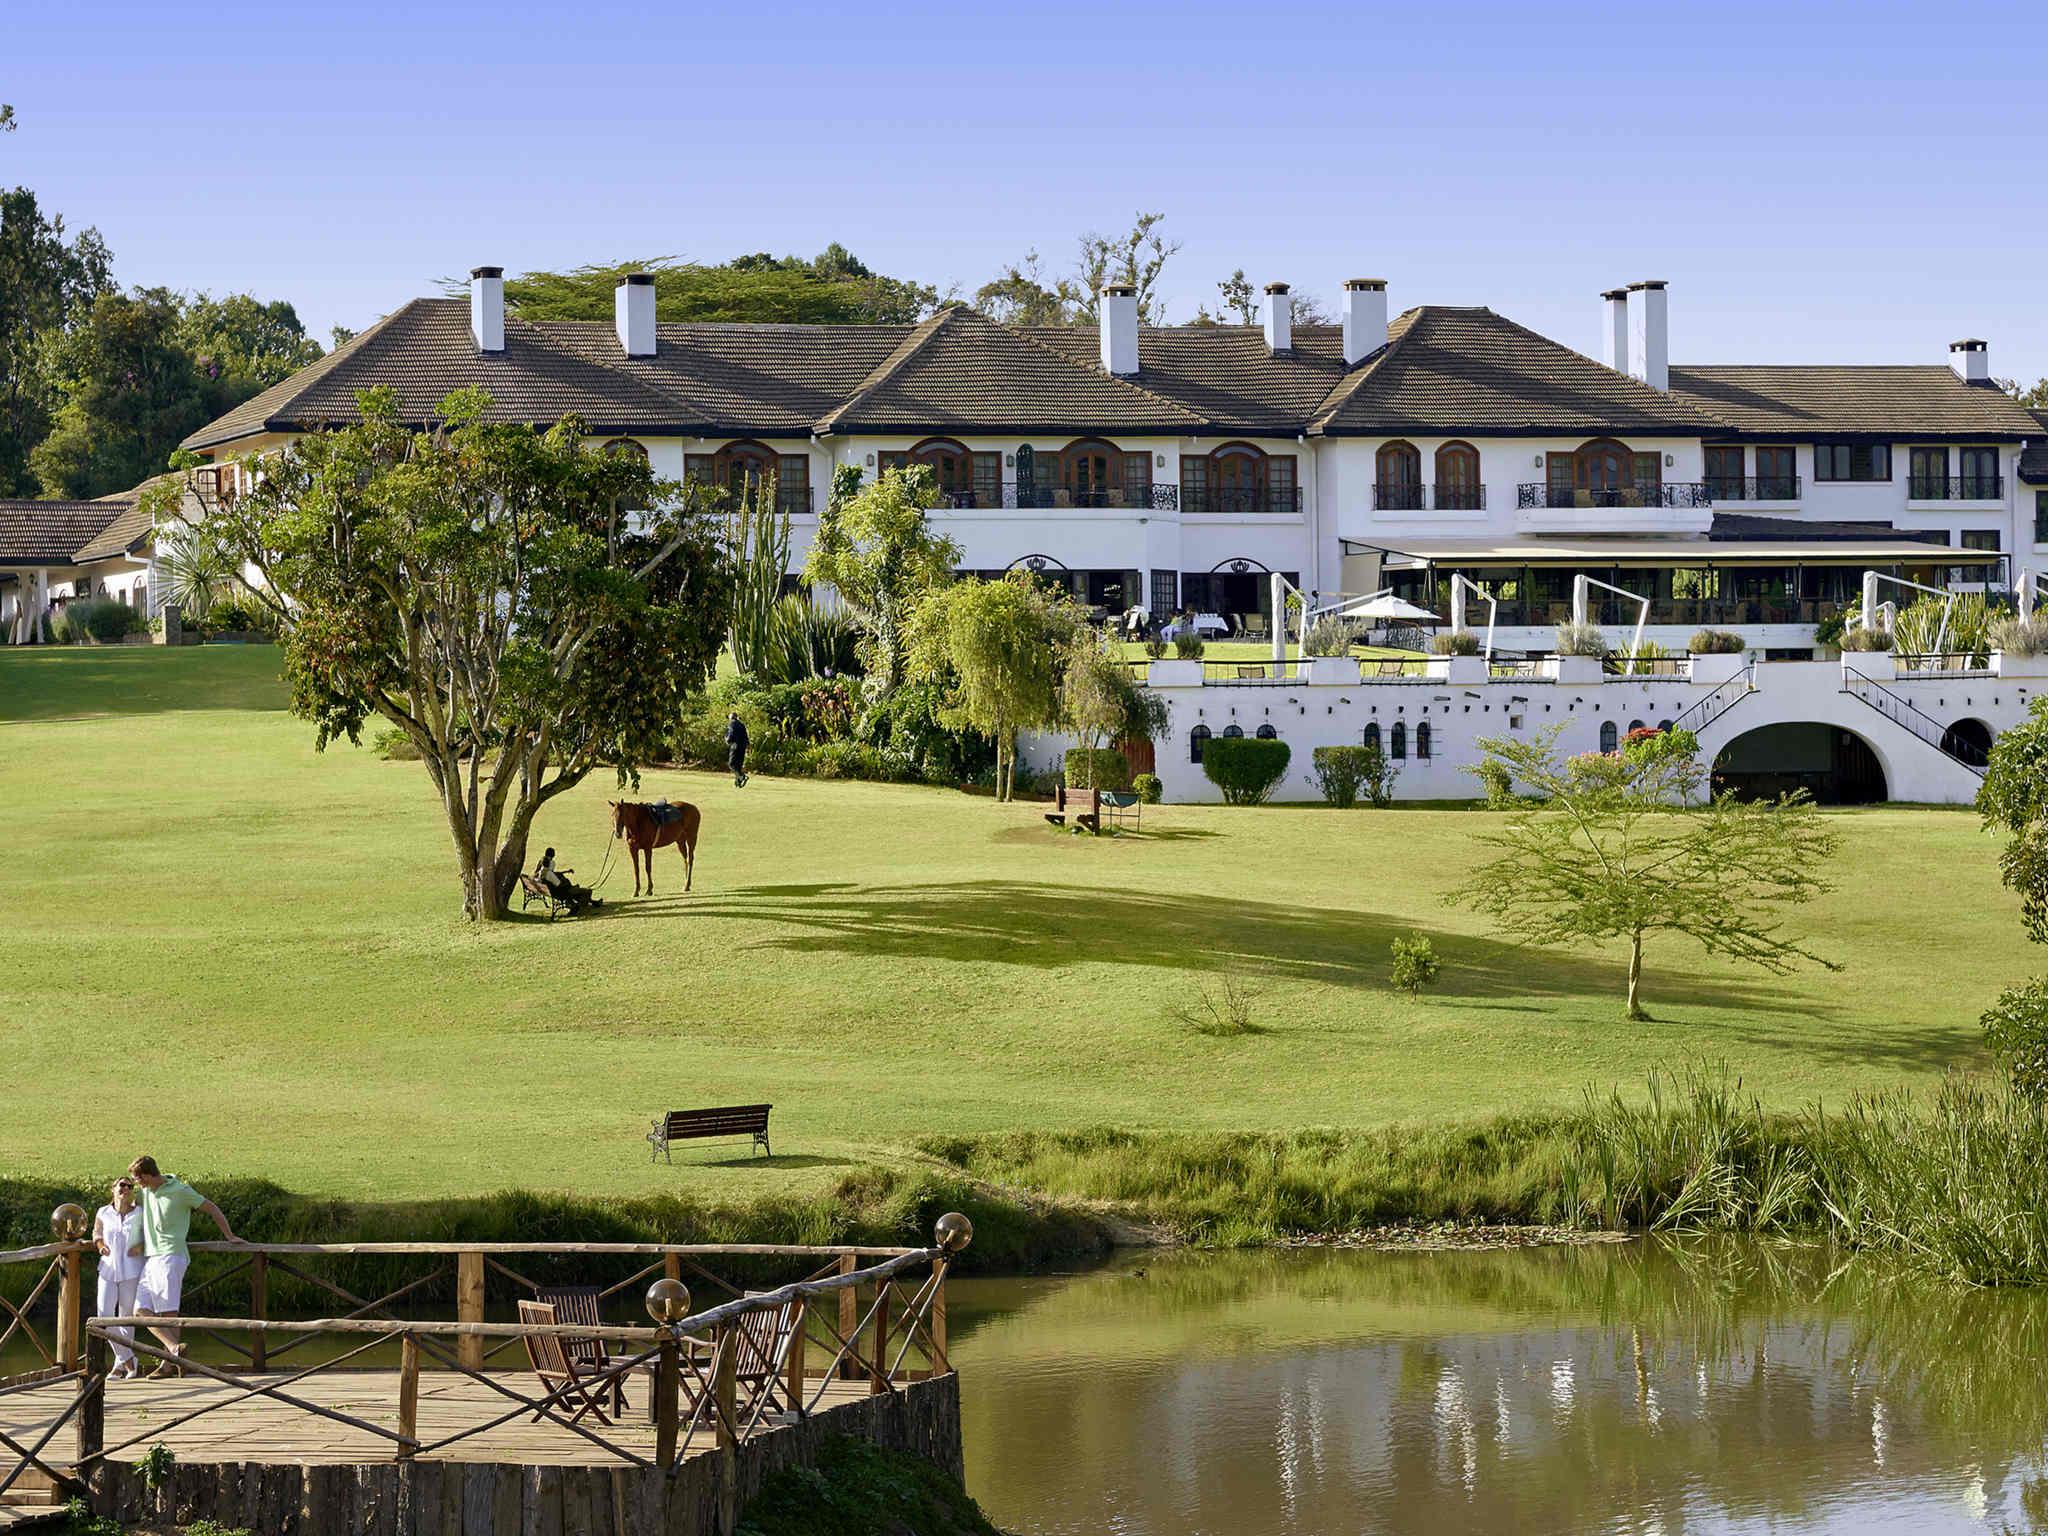 Otel – Fairmont Mount Kenya Safari Club